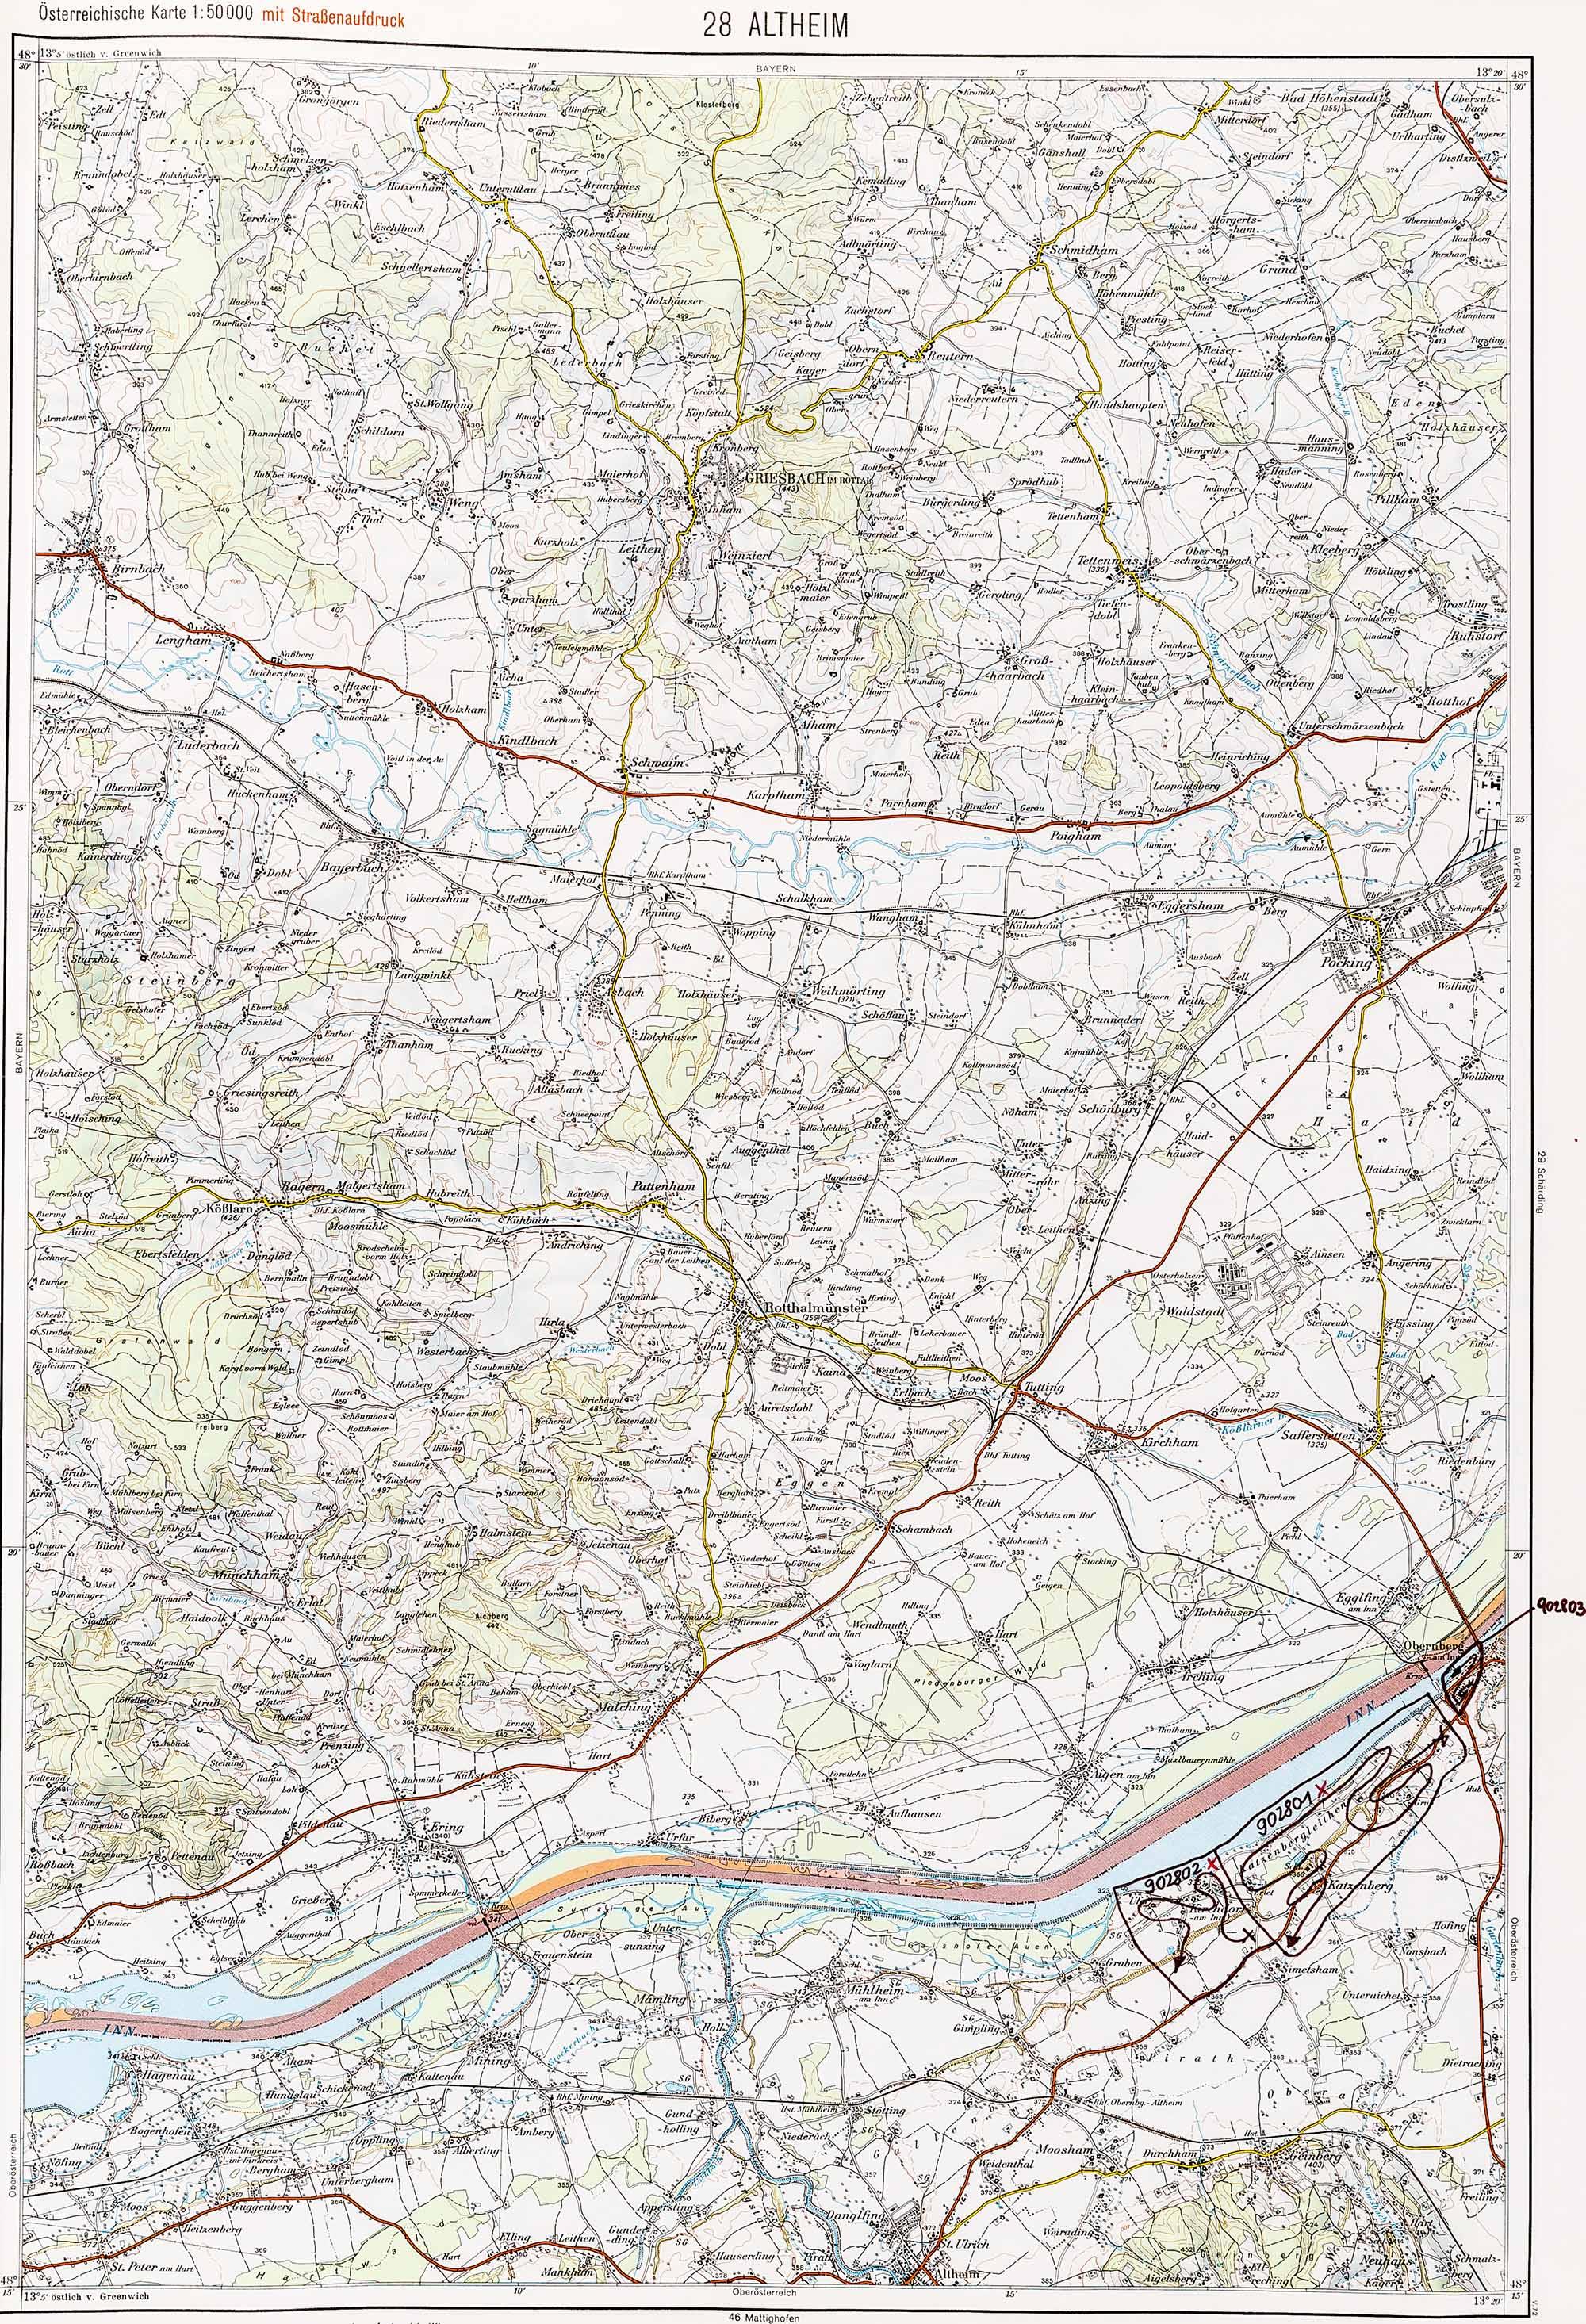 1975-1979 Karte 028